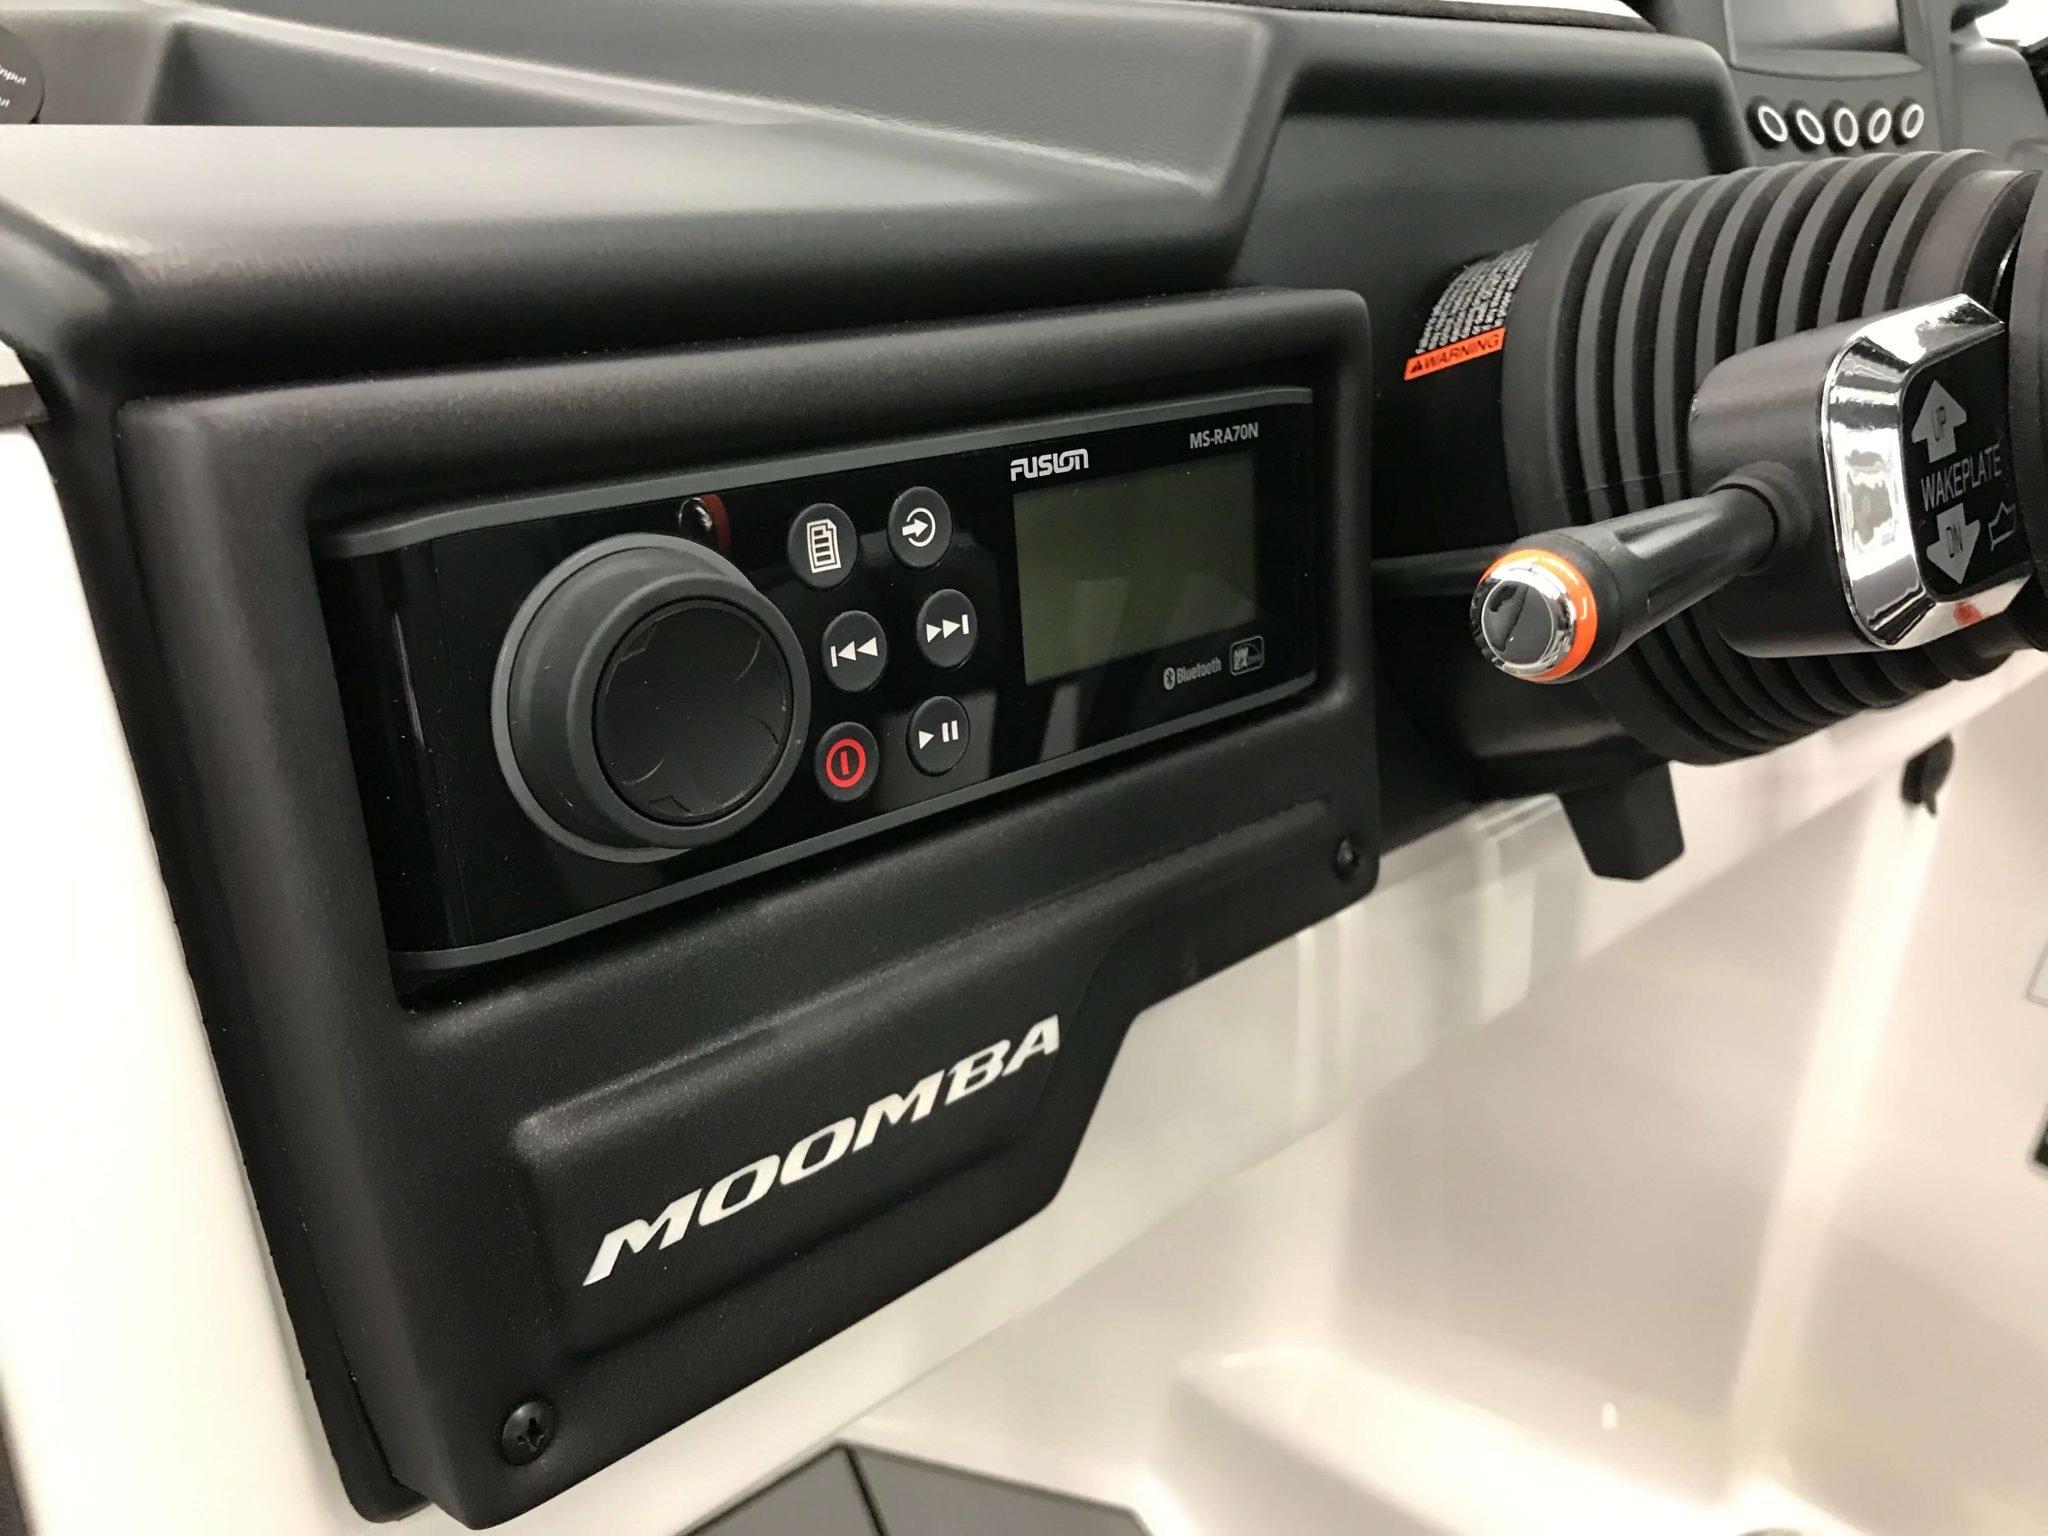 2019 Moomba Max Fusion Stereo